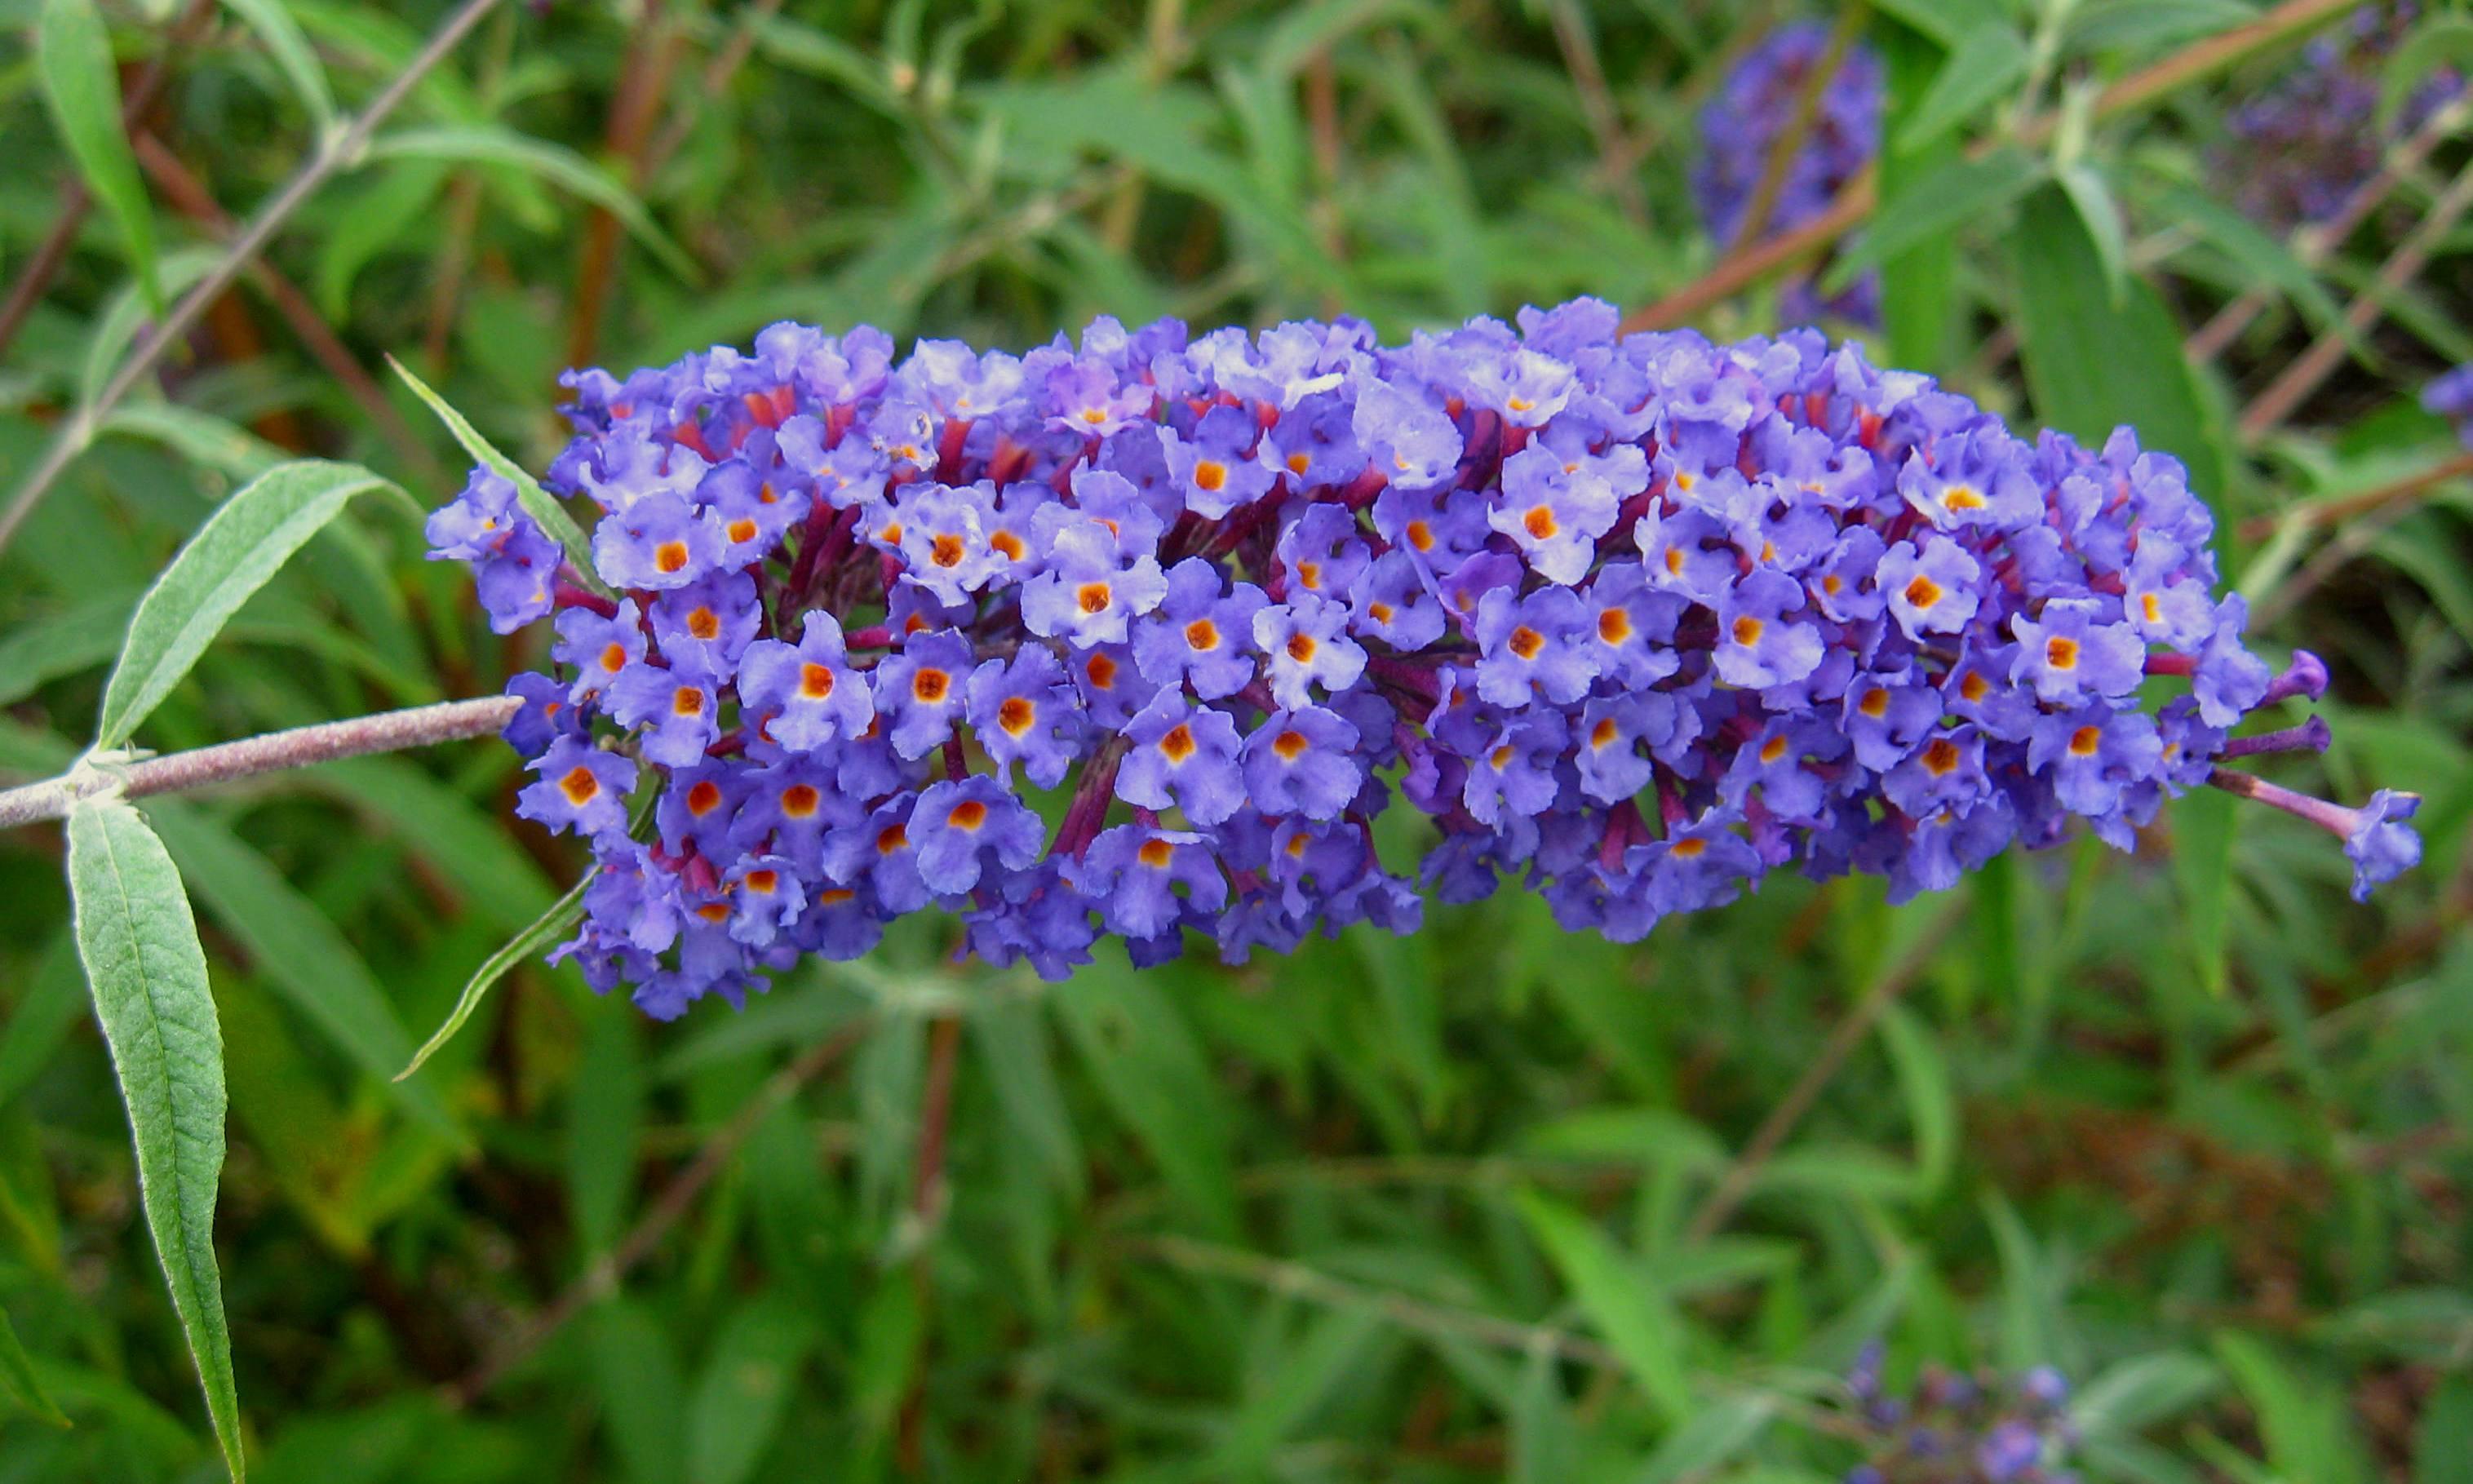 Buddleja davidii 'Nanho Blue', vlinderstruik, droogte, droge zomer, tuinen.nl